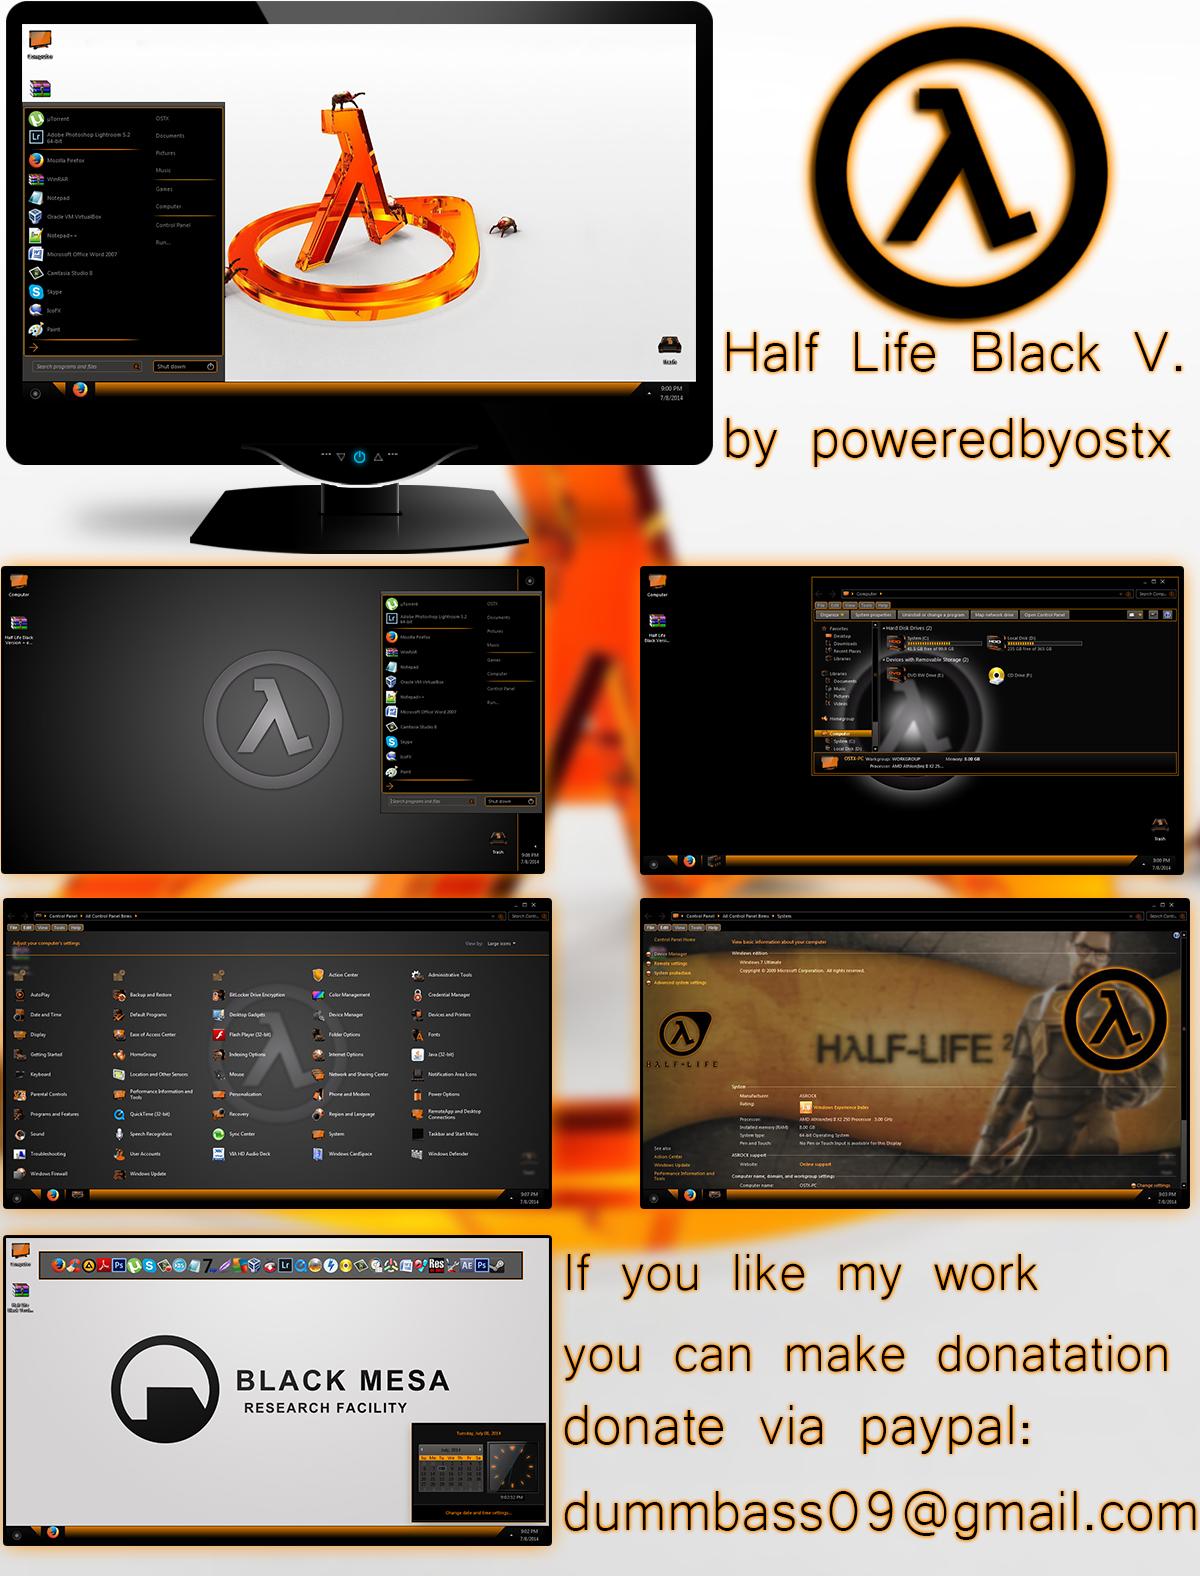 Half Life Black Version Windows 7 theme by poweredbyostx